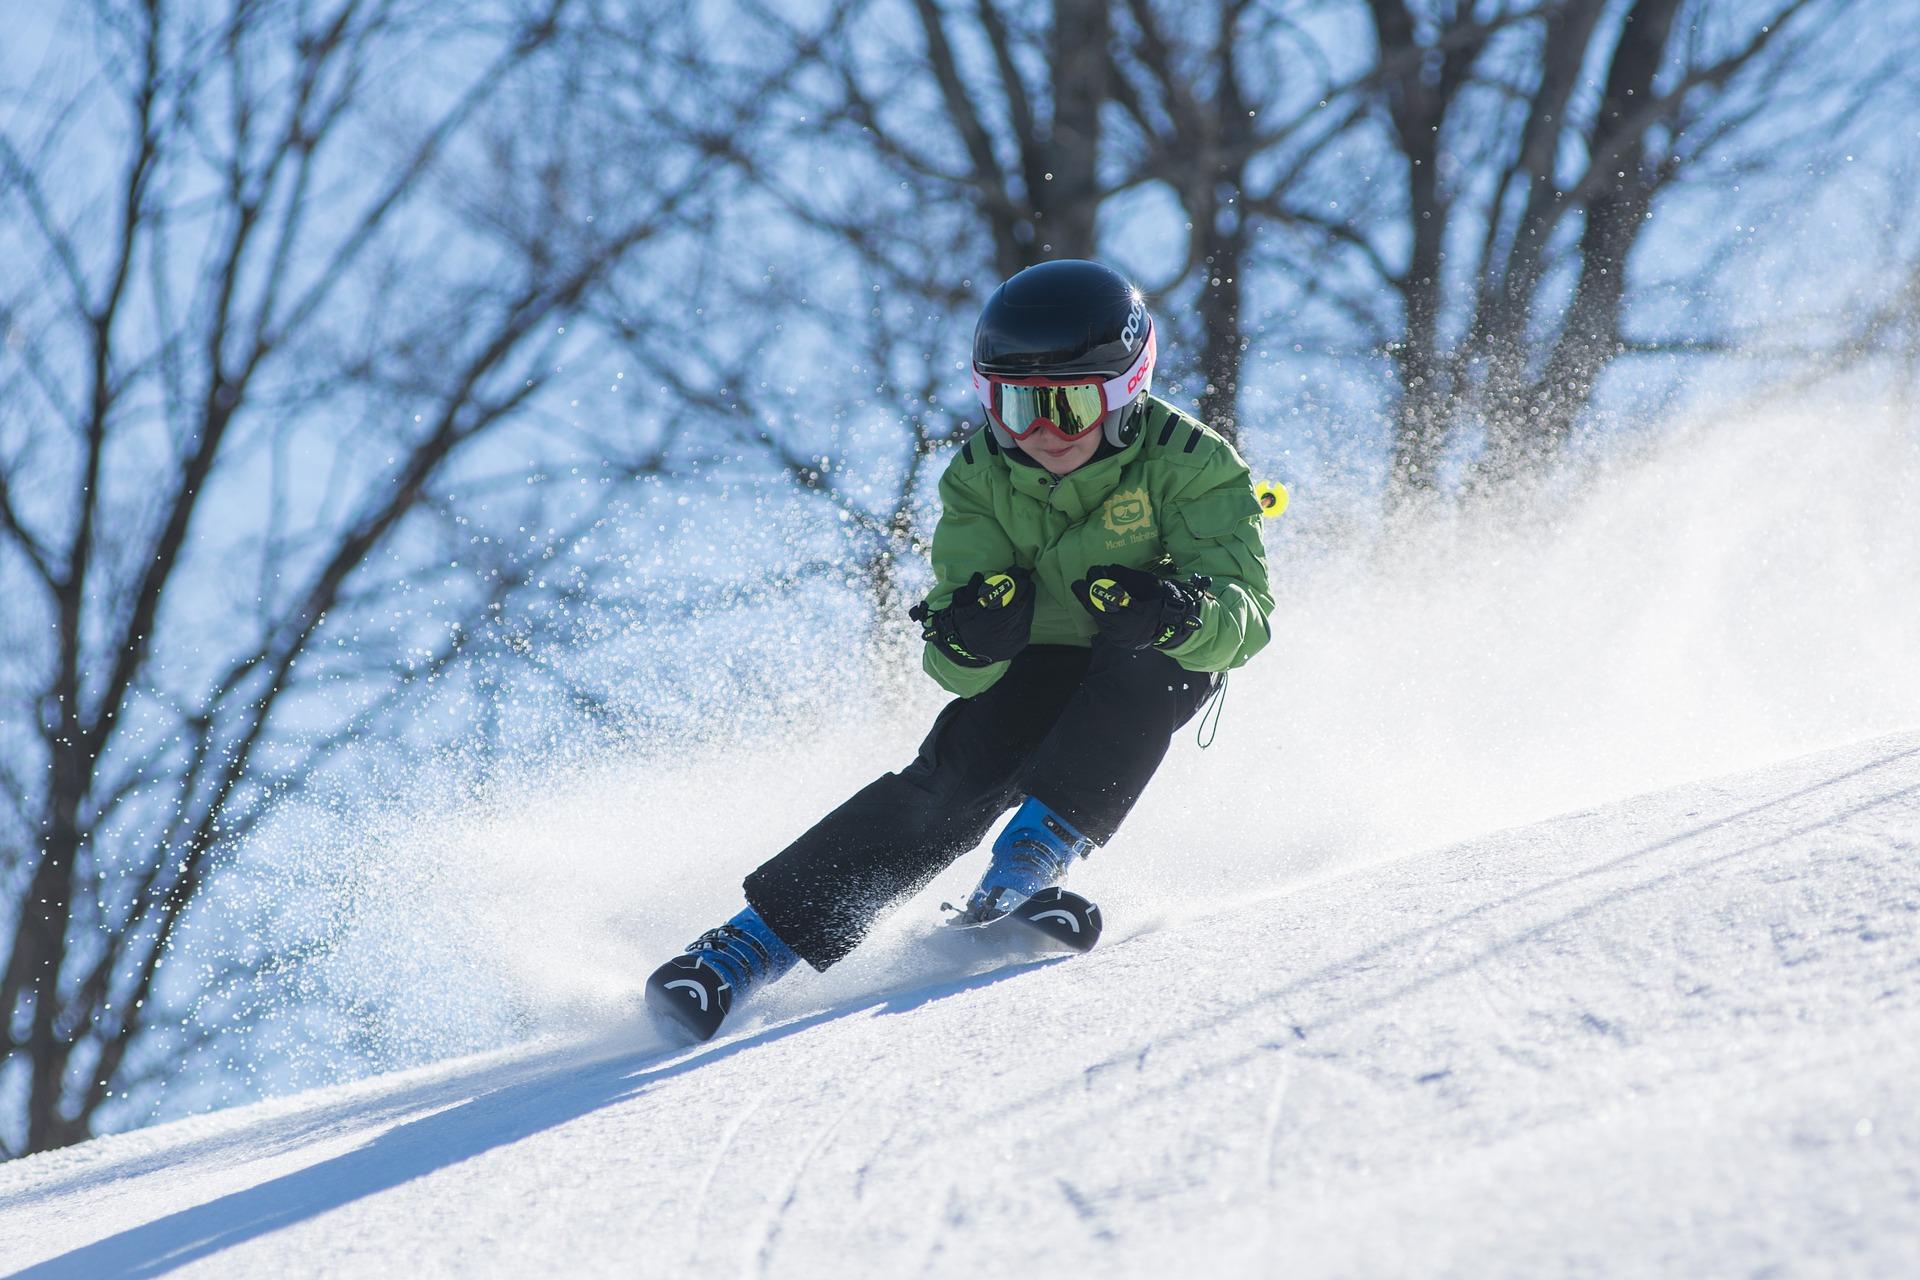 ребенок сноуборд спорт